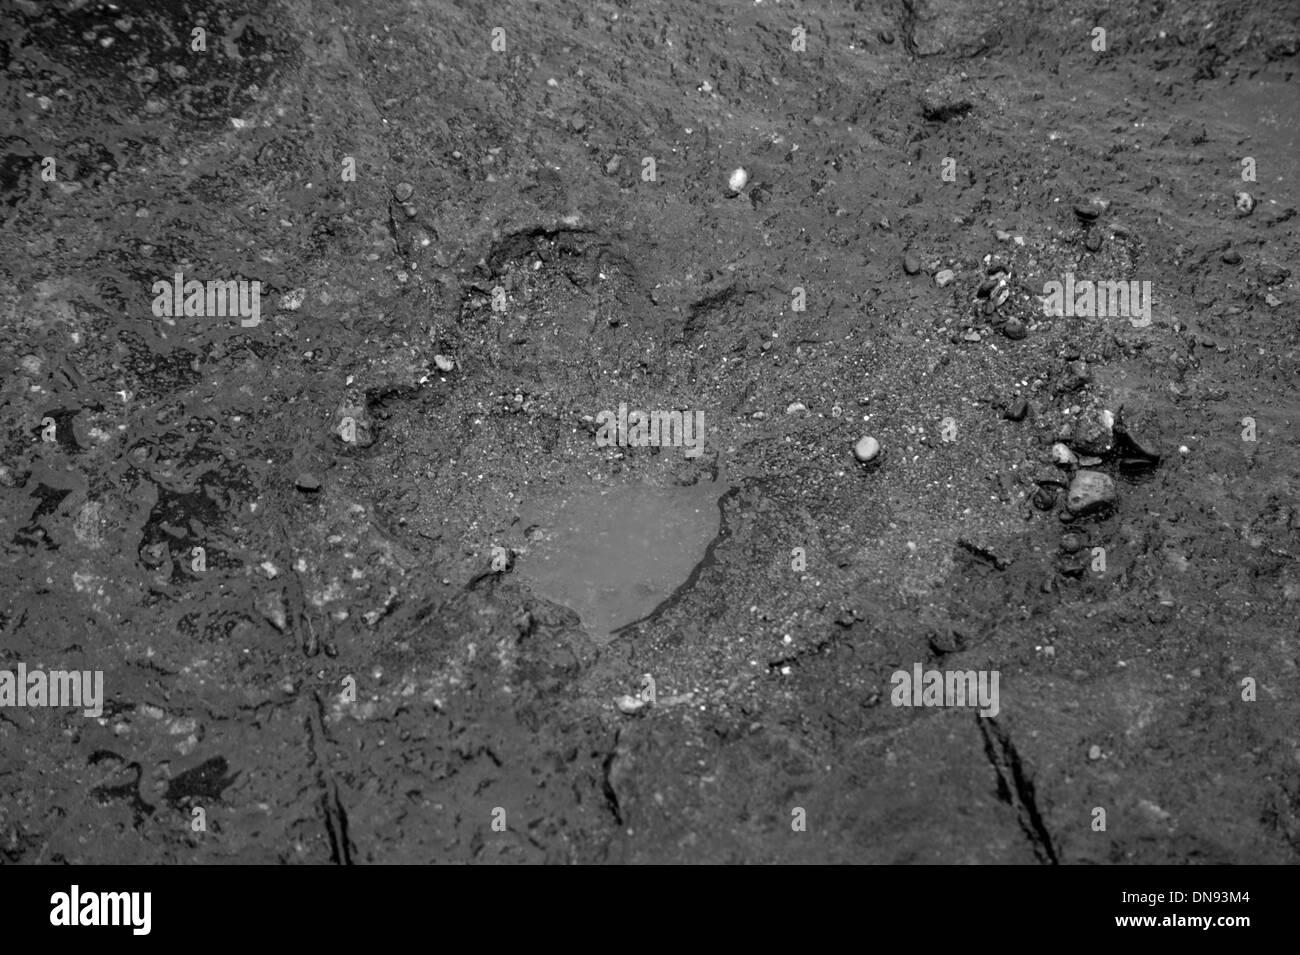 Dinosaur Footprint at Barry, South Wales - Stock Image